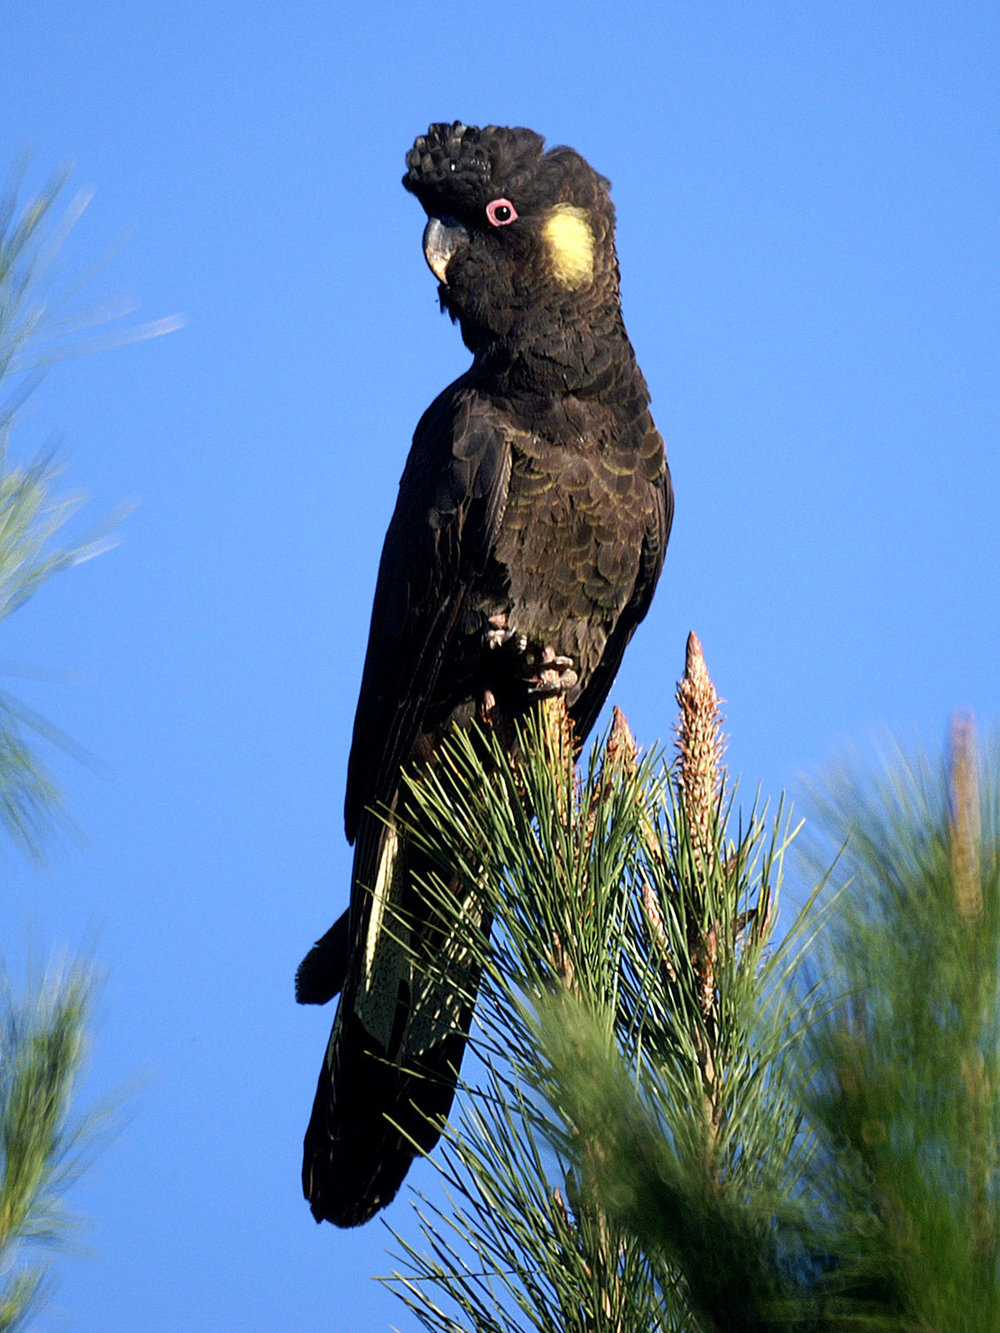 yellow-tailed-black-cockatoo-01.jpg